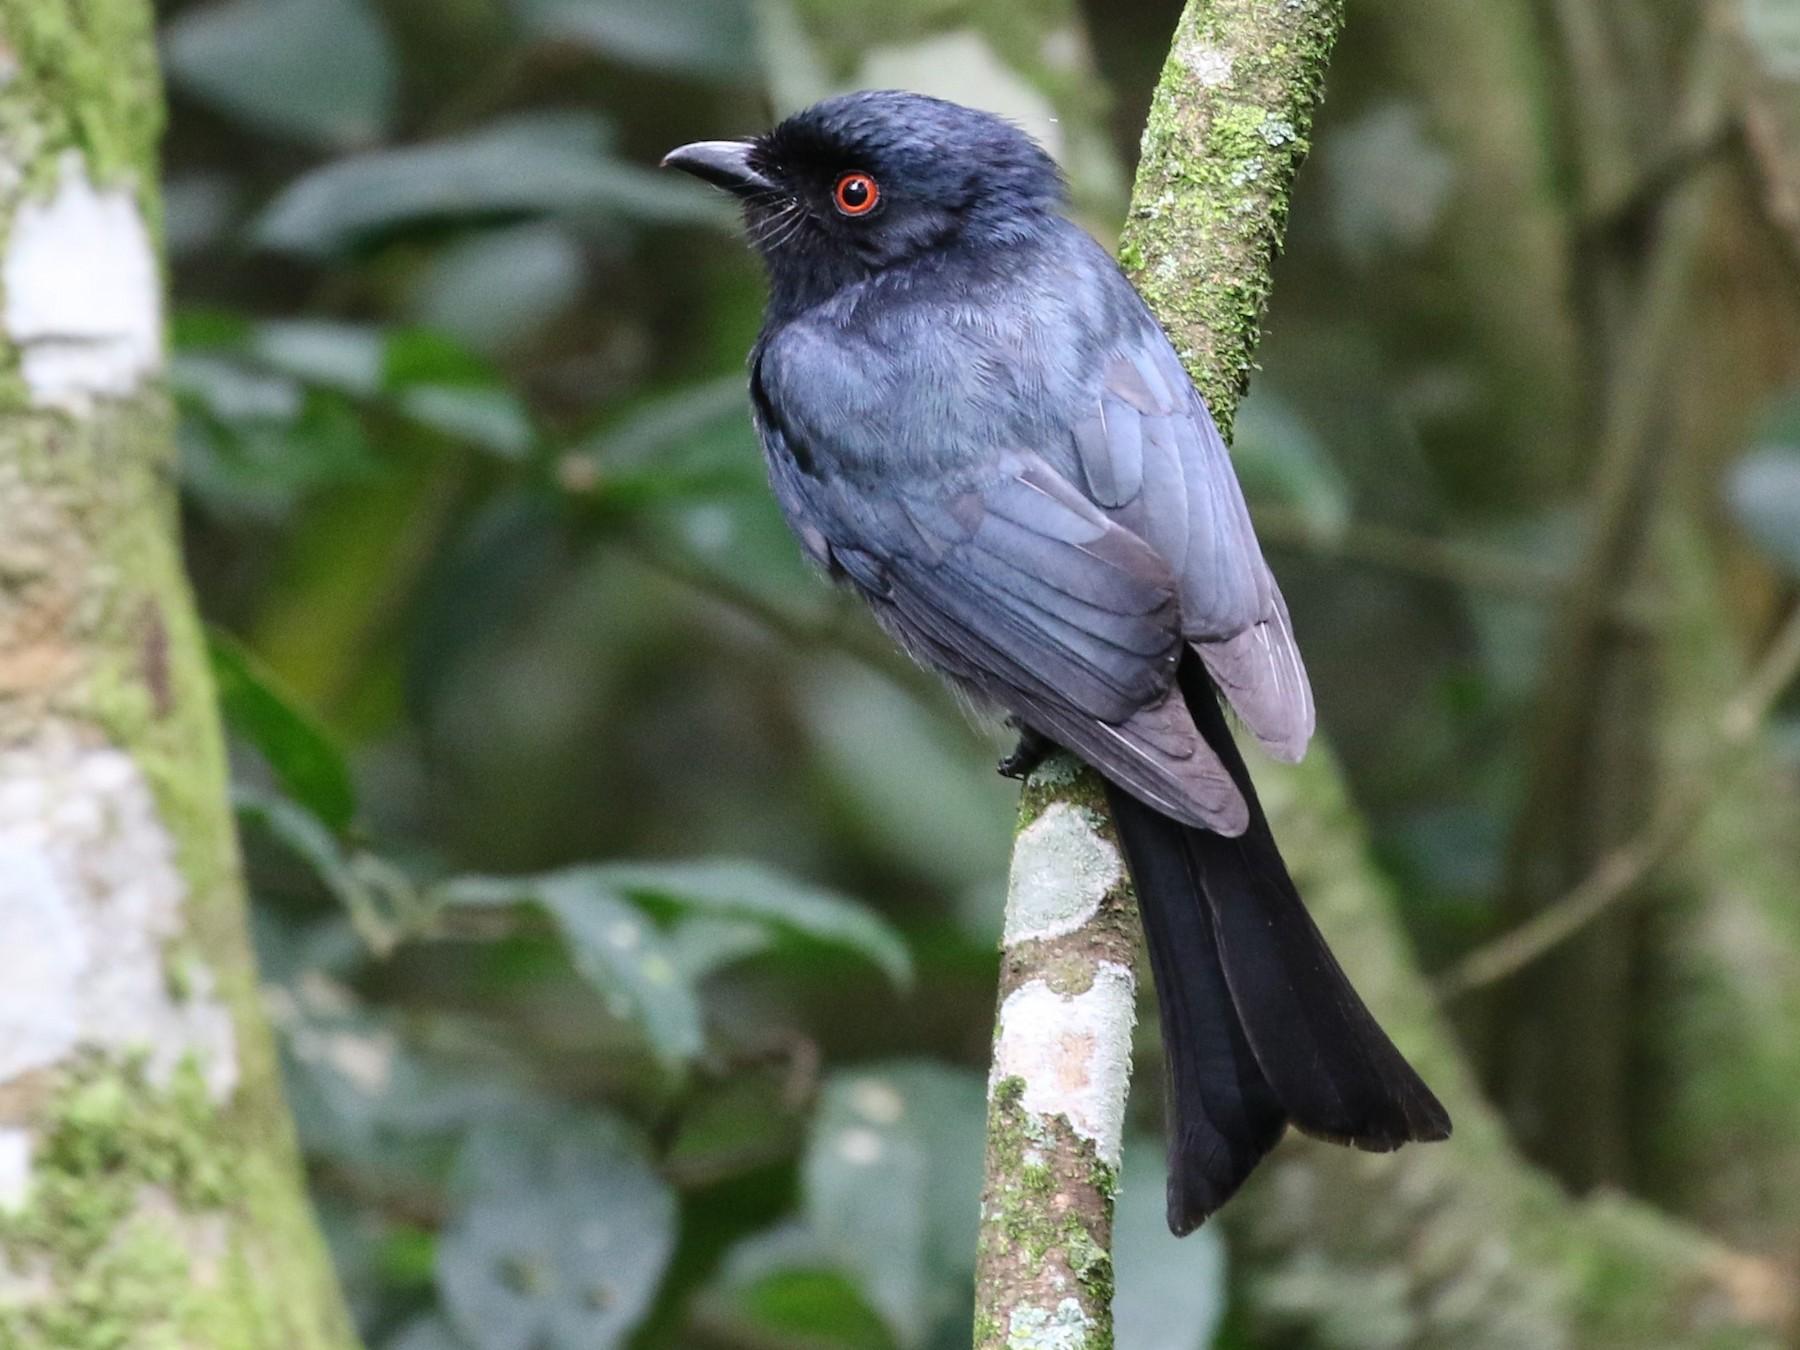 Common Square-tailed Drongo - Dean LaTray